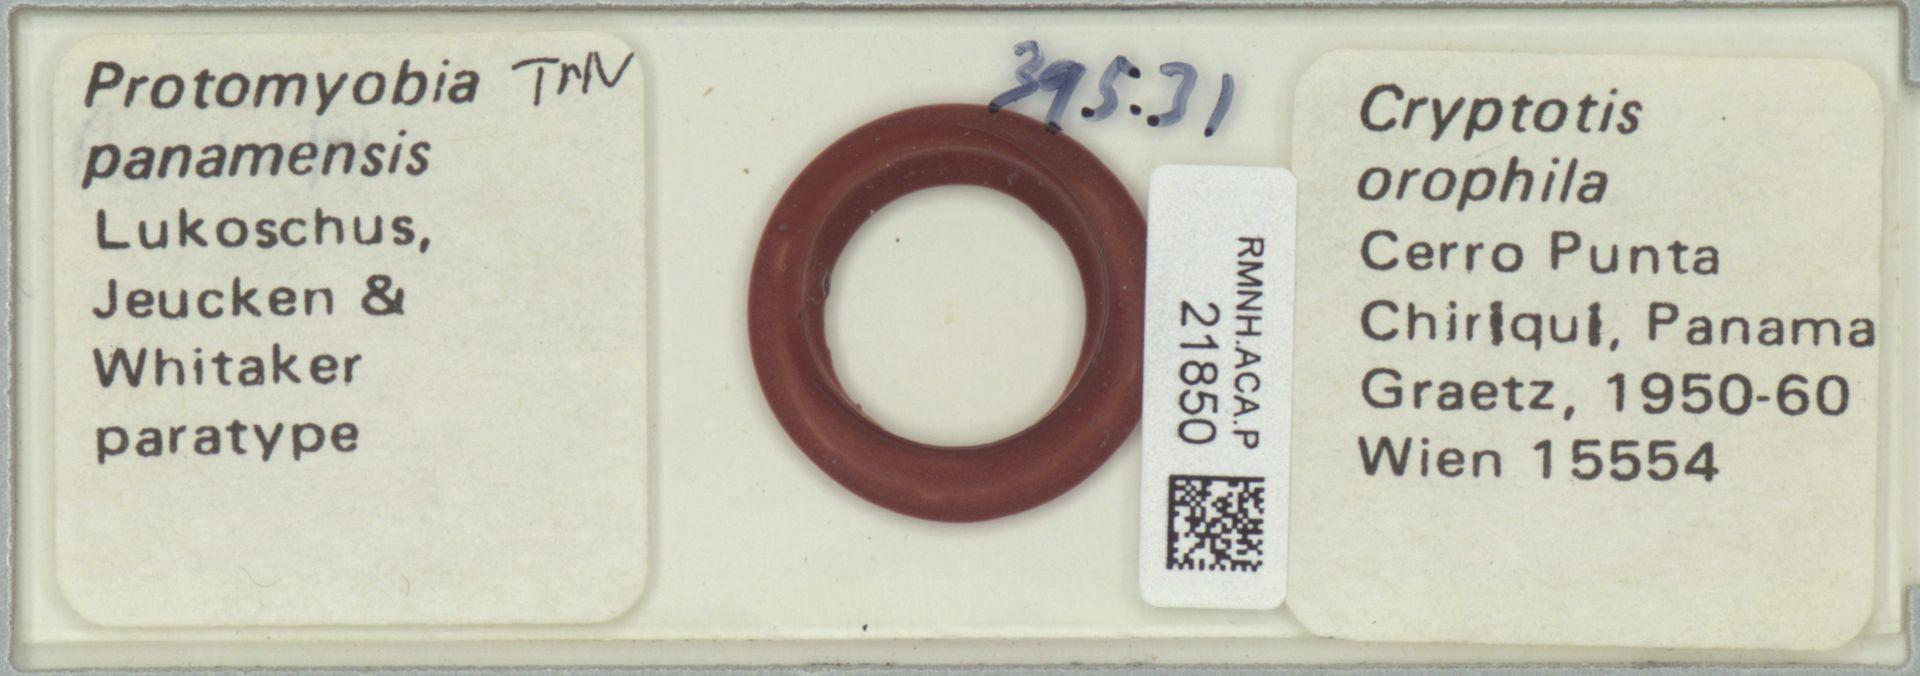 RMNH.ACA.P.21850 | Protomyobia panamensis Lukoschus, Jeucken & Whitaker